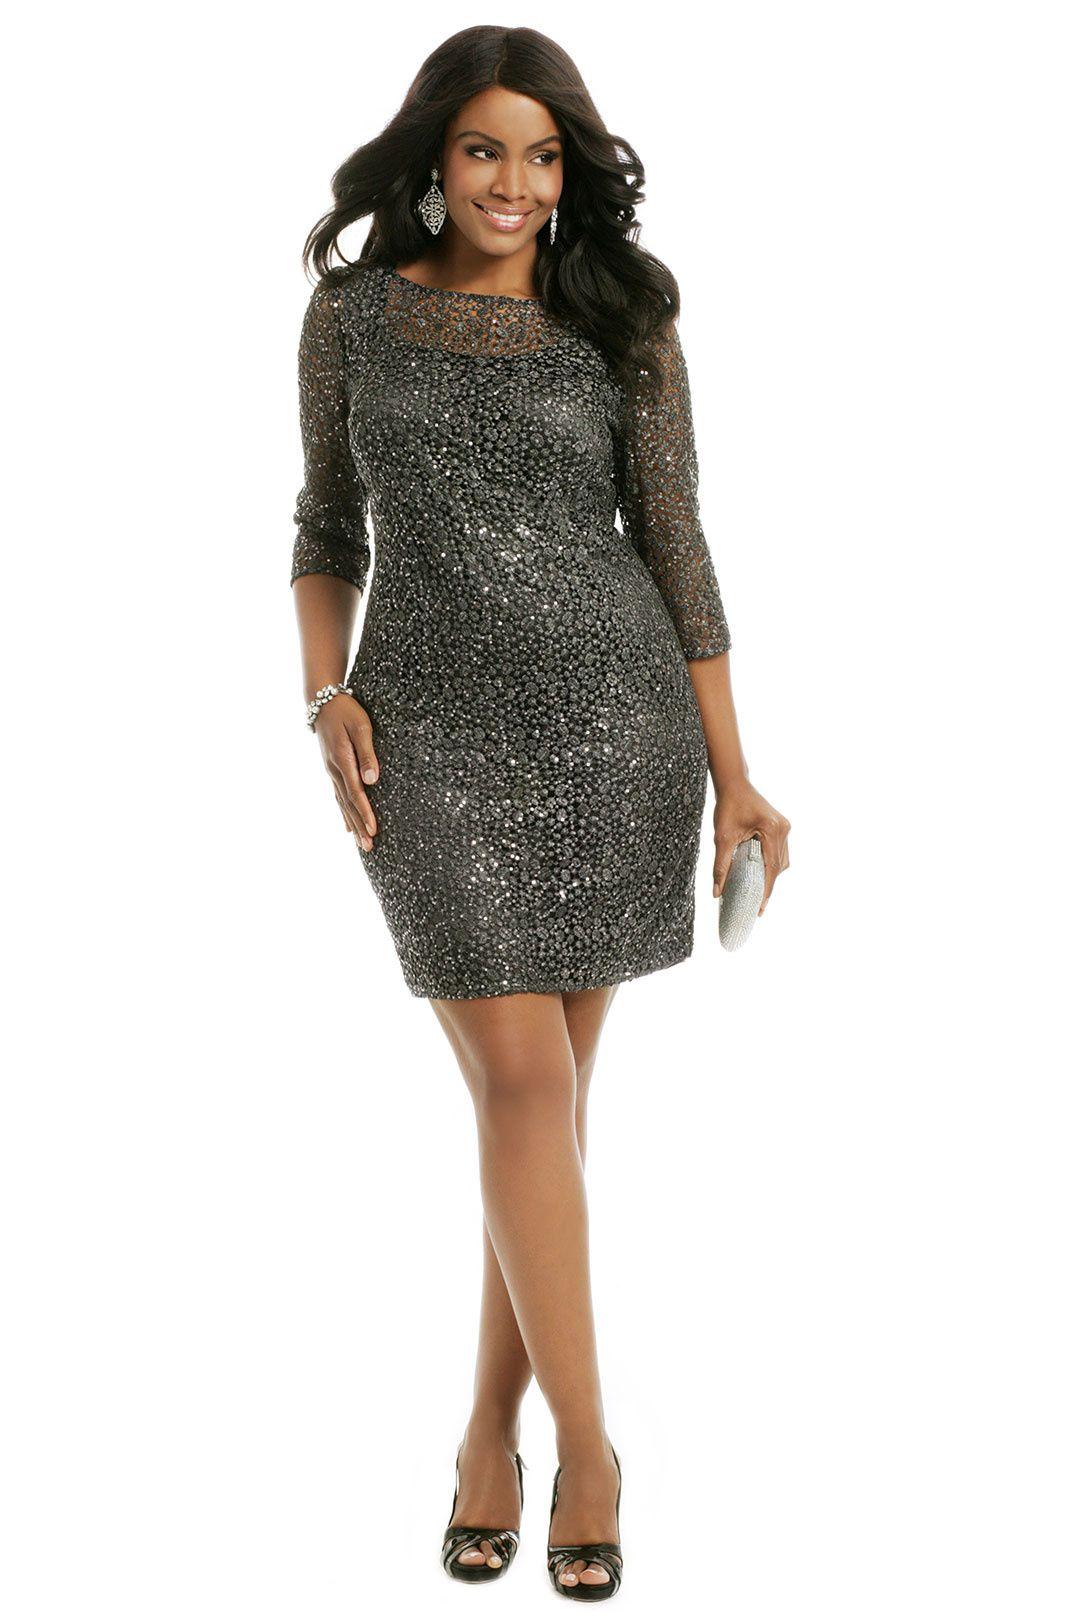 09a68d0f51a4 12 Gorgeous Plus Size Prom Dresses – Where to Buy Plus Size Prom Dresses for  2019